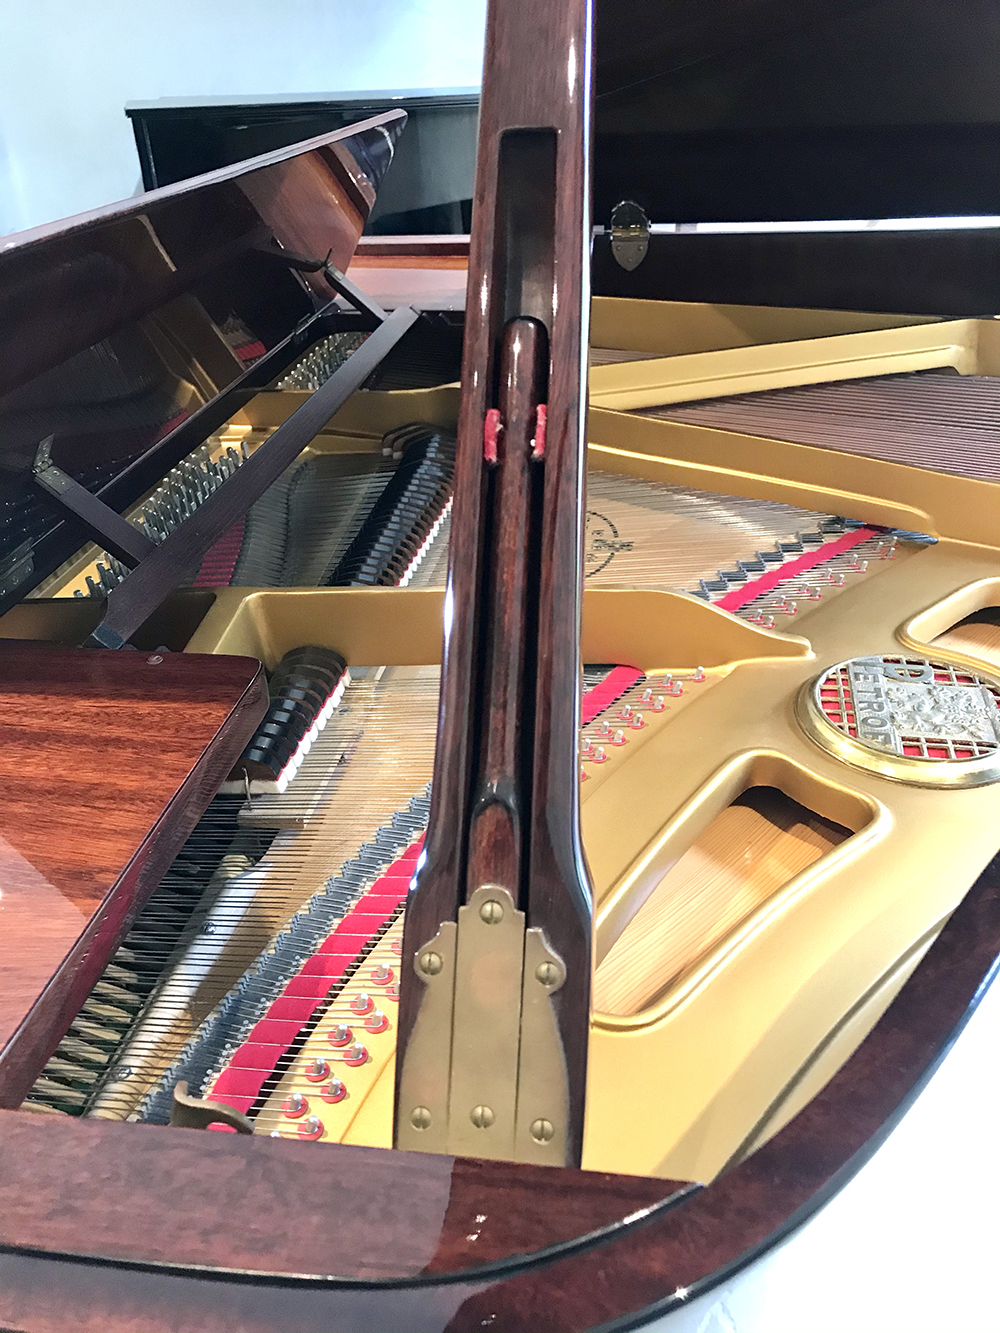 used-petrof-baby-grand-Piano-Dorset-for-sale-11.jpg